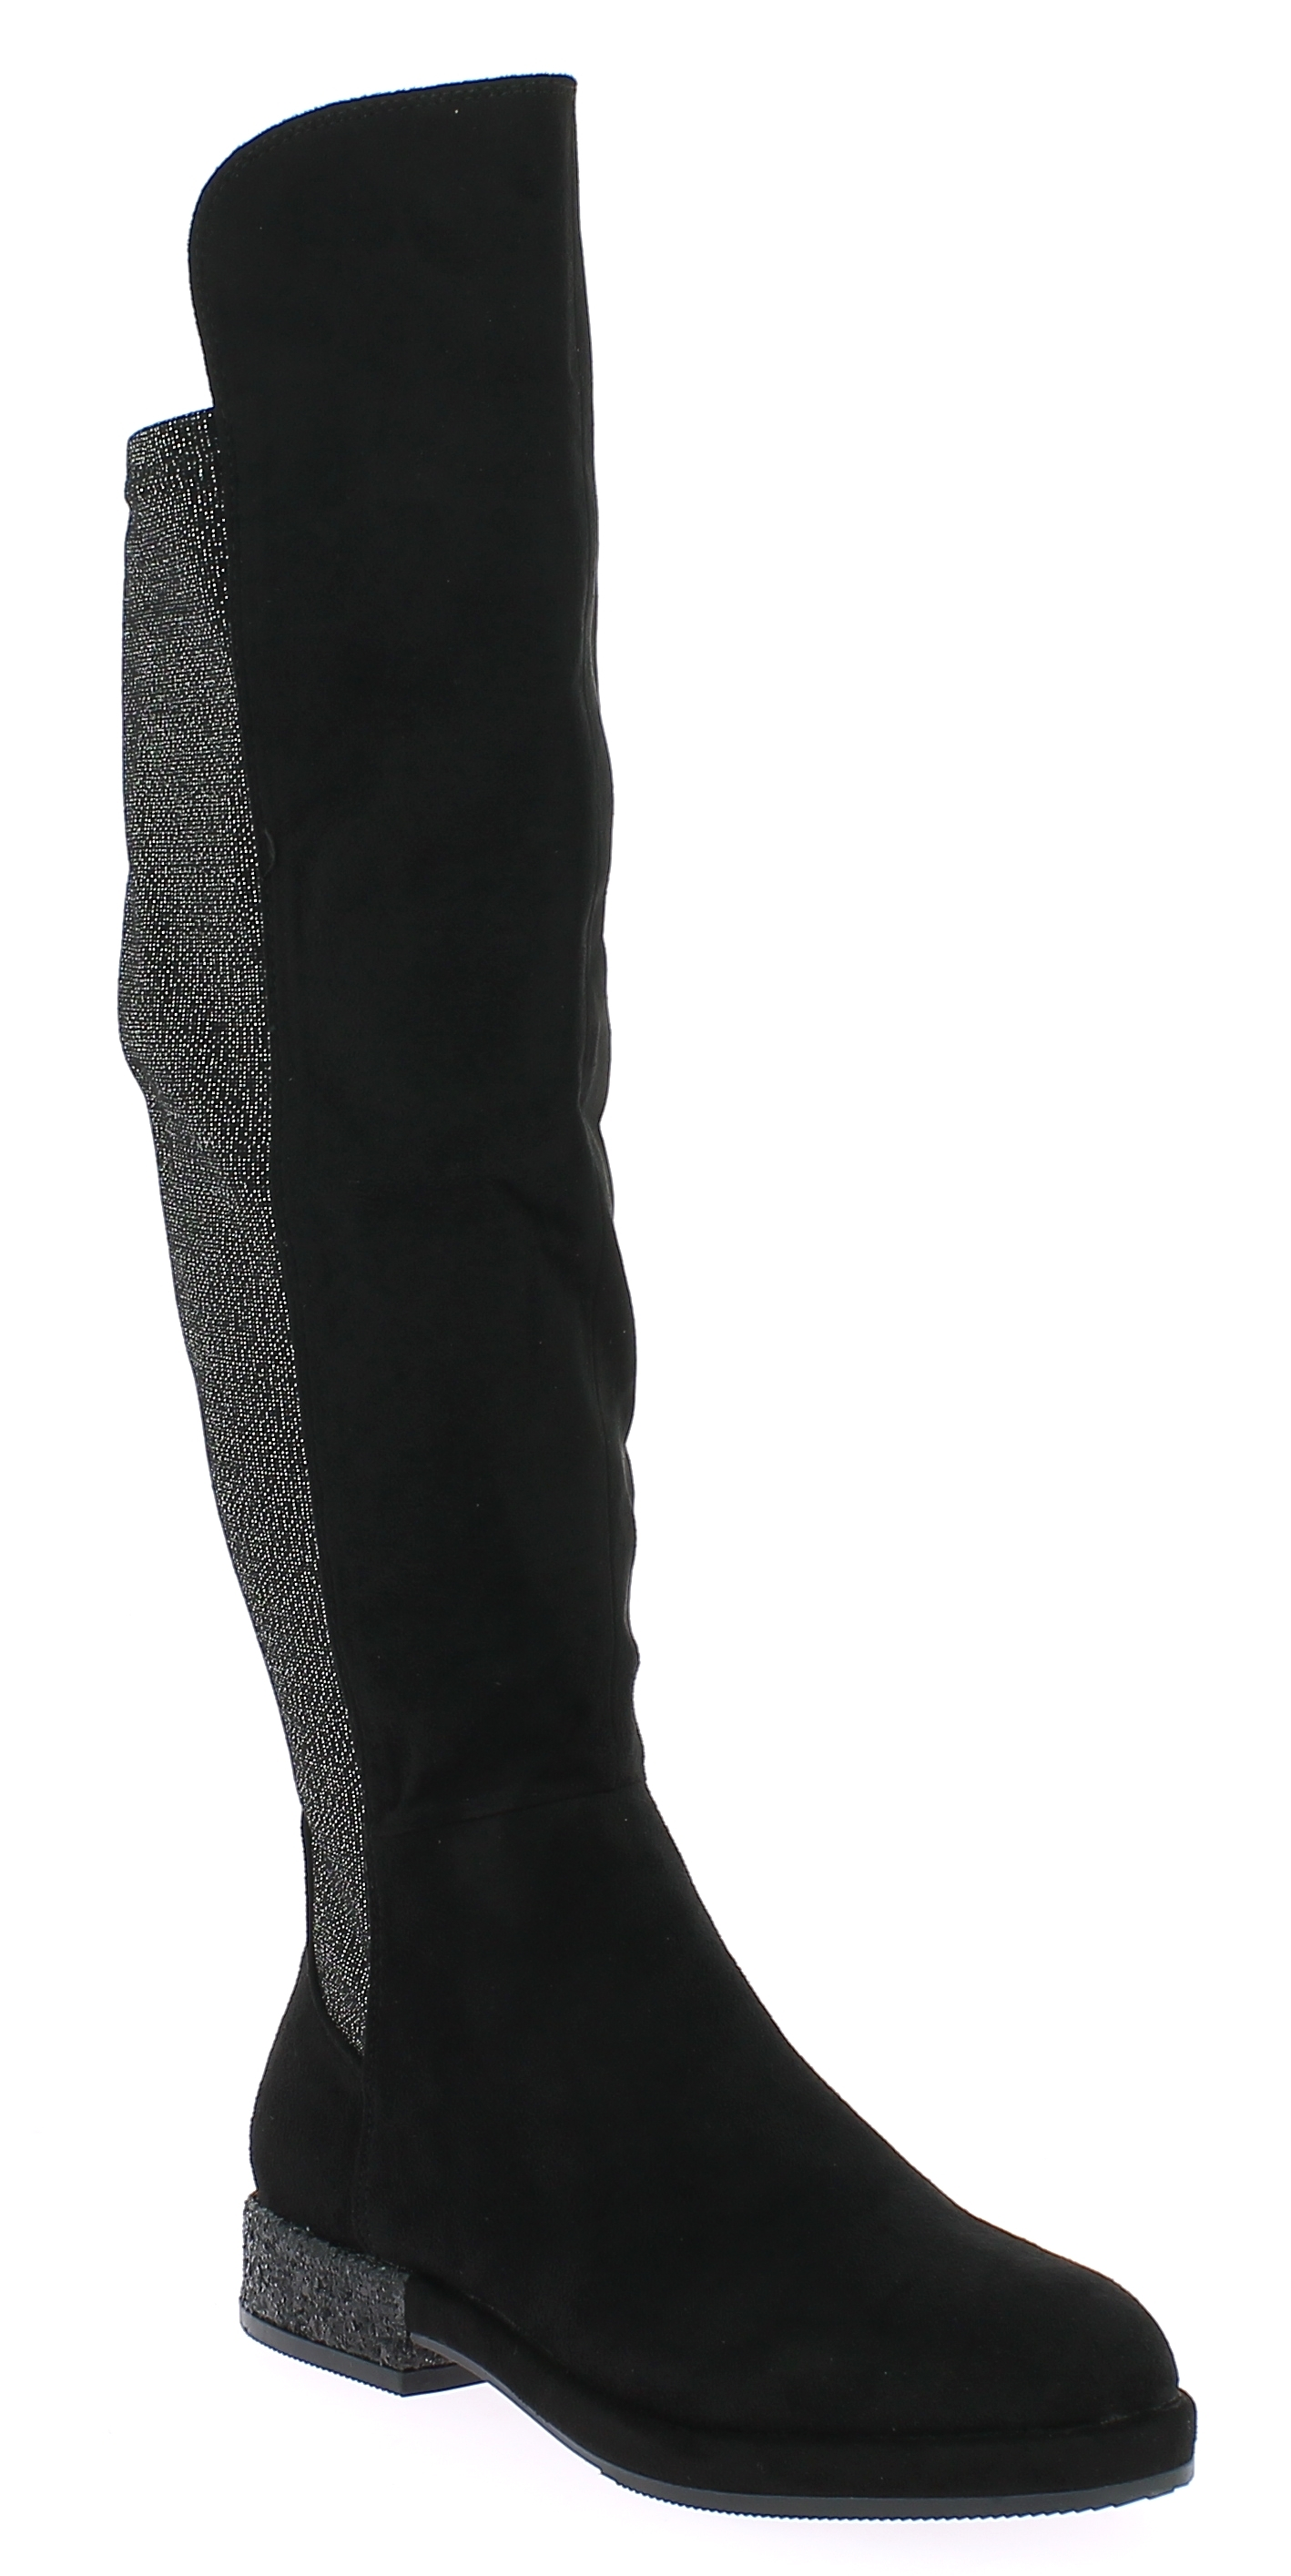 IQSHOES Γυναικεία Μπότα 2979801 Μαύρο - IqShoes - 2.979801 BLACK-black-38/1/15/1 παπούτσια  προσφορεσ